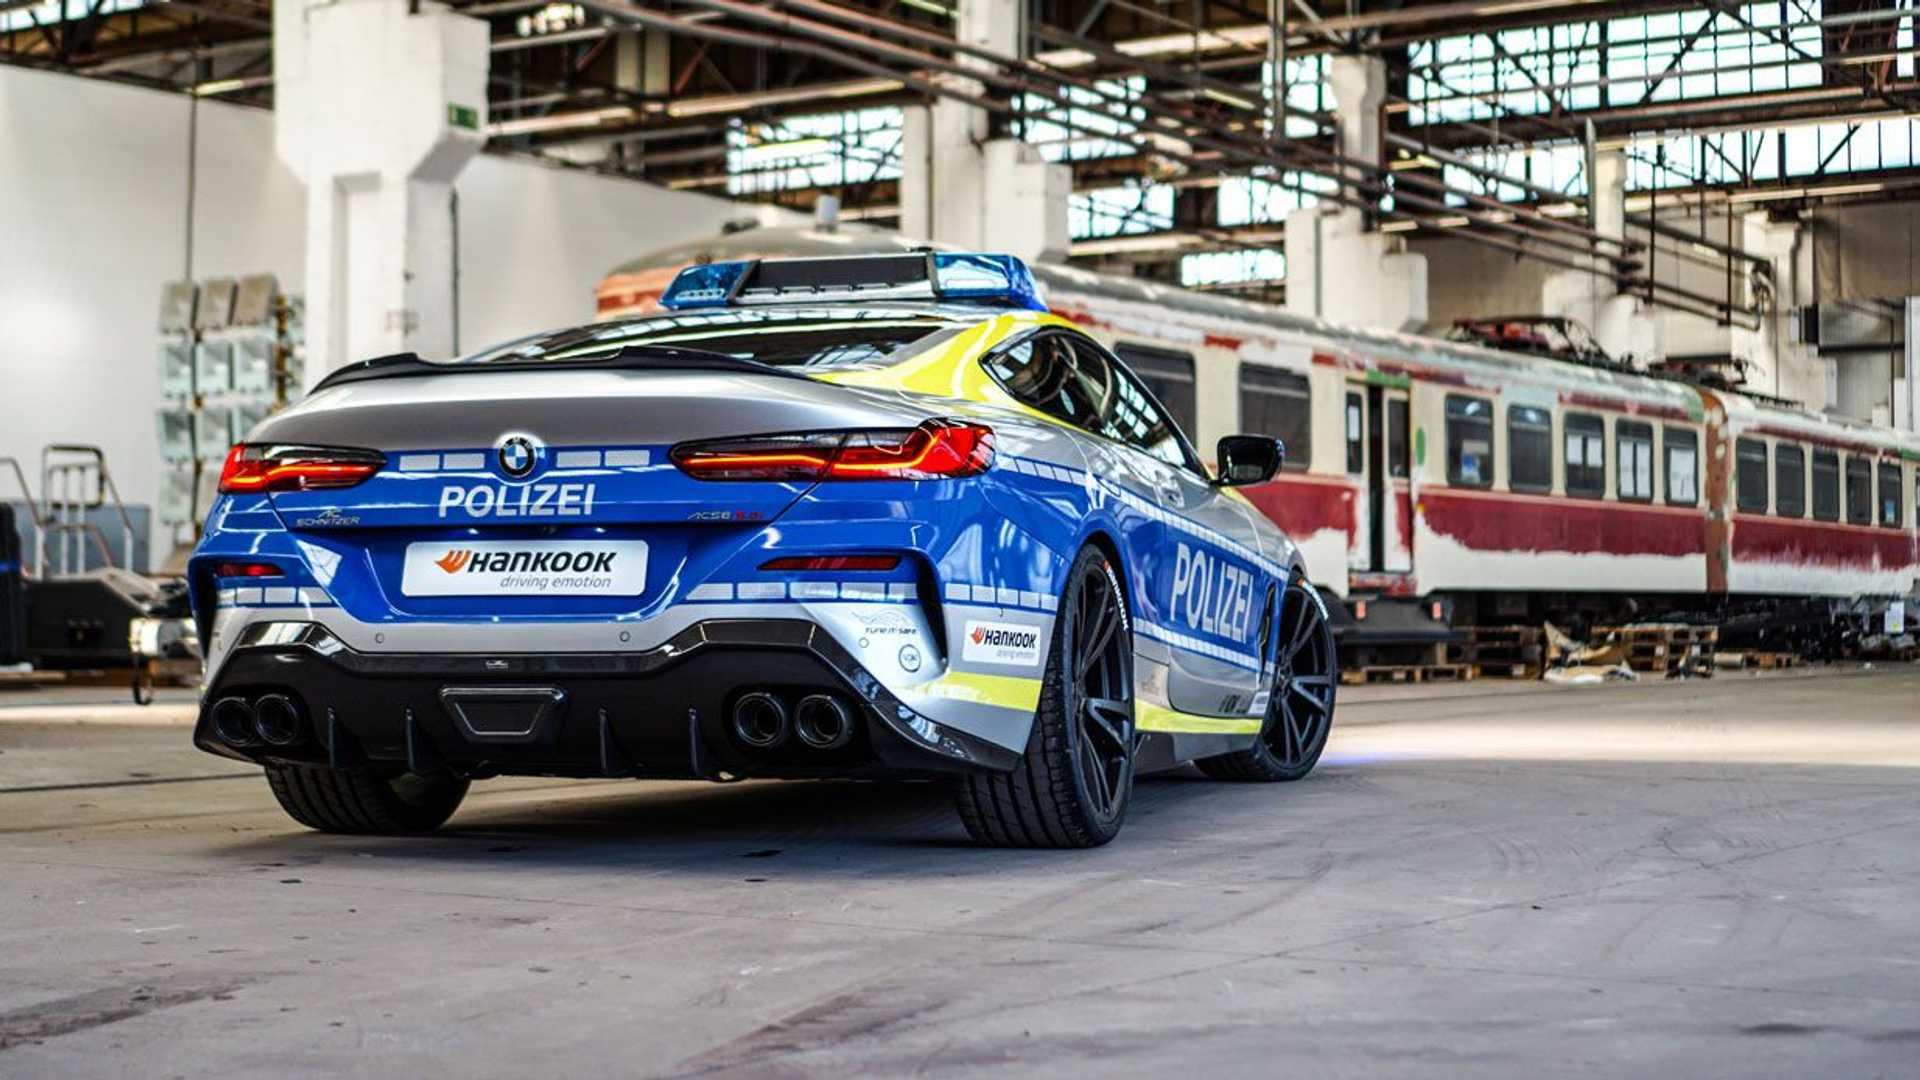 BMW-M850i-police-car-tune-it-safe-31